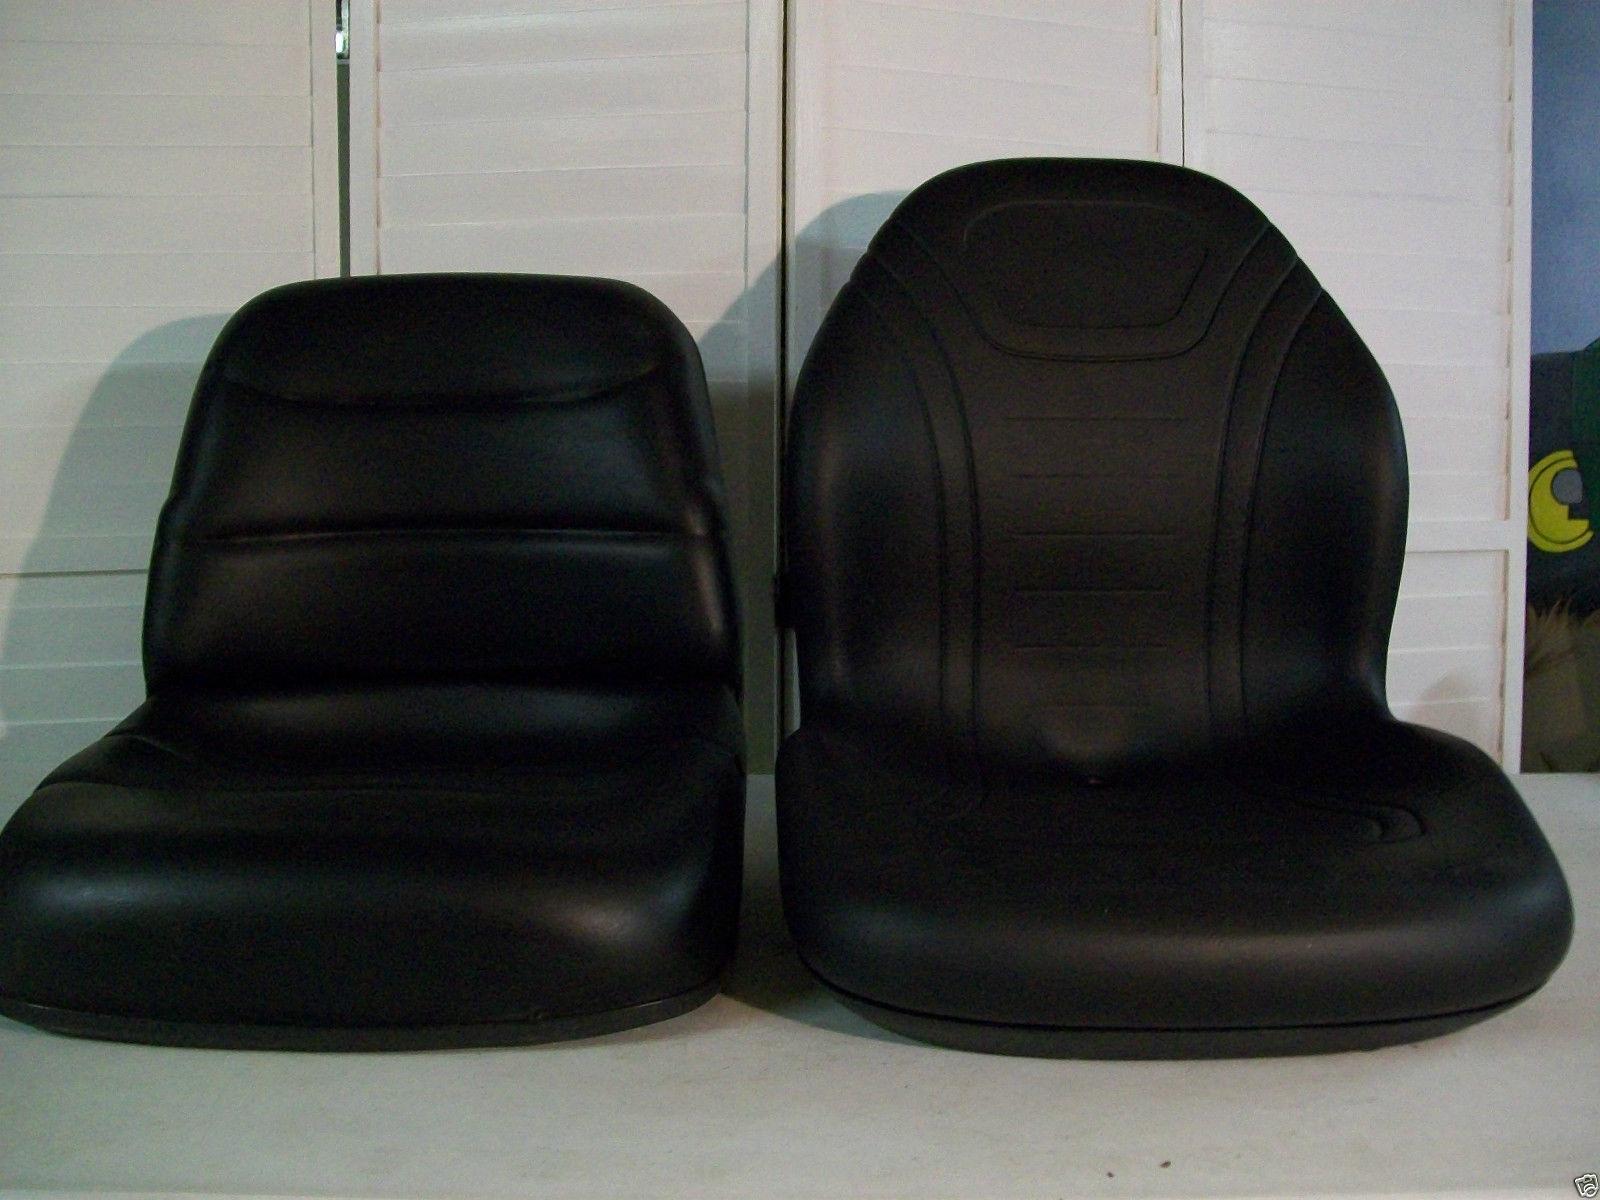 NEW BLACK SEAT FOR FORD NEW HOLLAND TC COMPACT TRACTORS TC25, TC29, TC30,  TC33, TC35, TC40, TC45 #BL